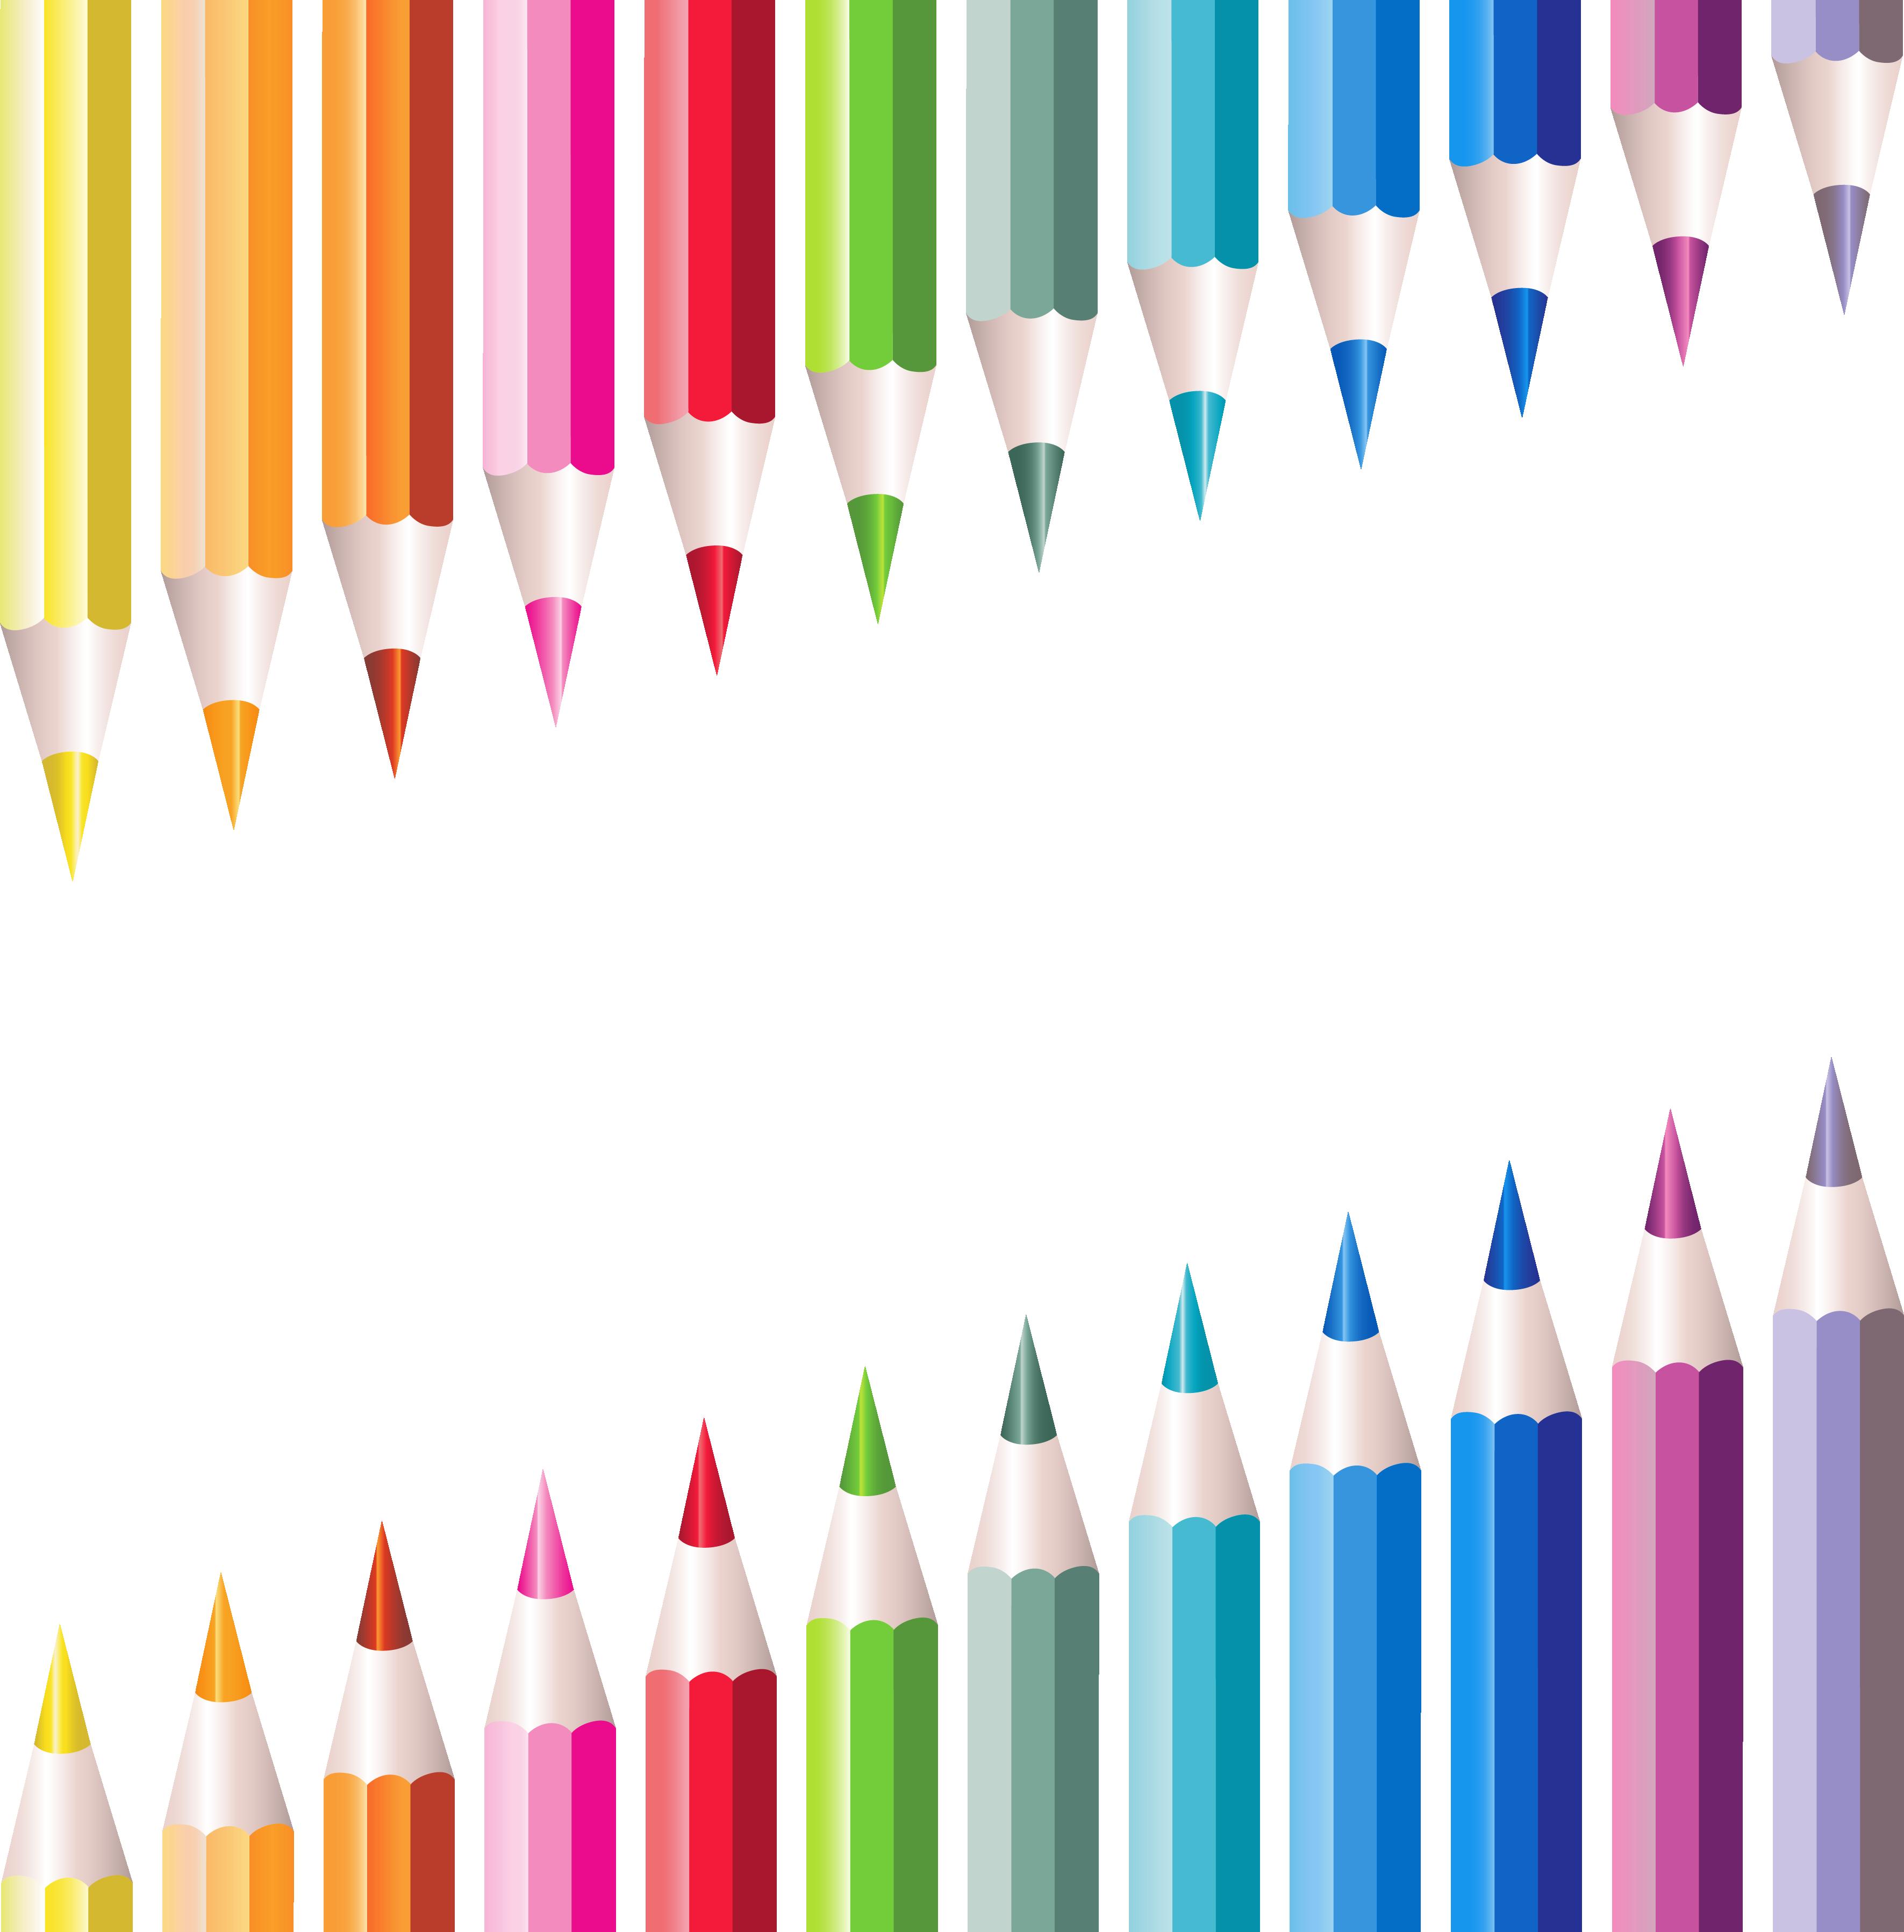 Transparent pencils decoration pinterest. Clipart pencil school